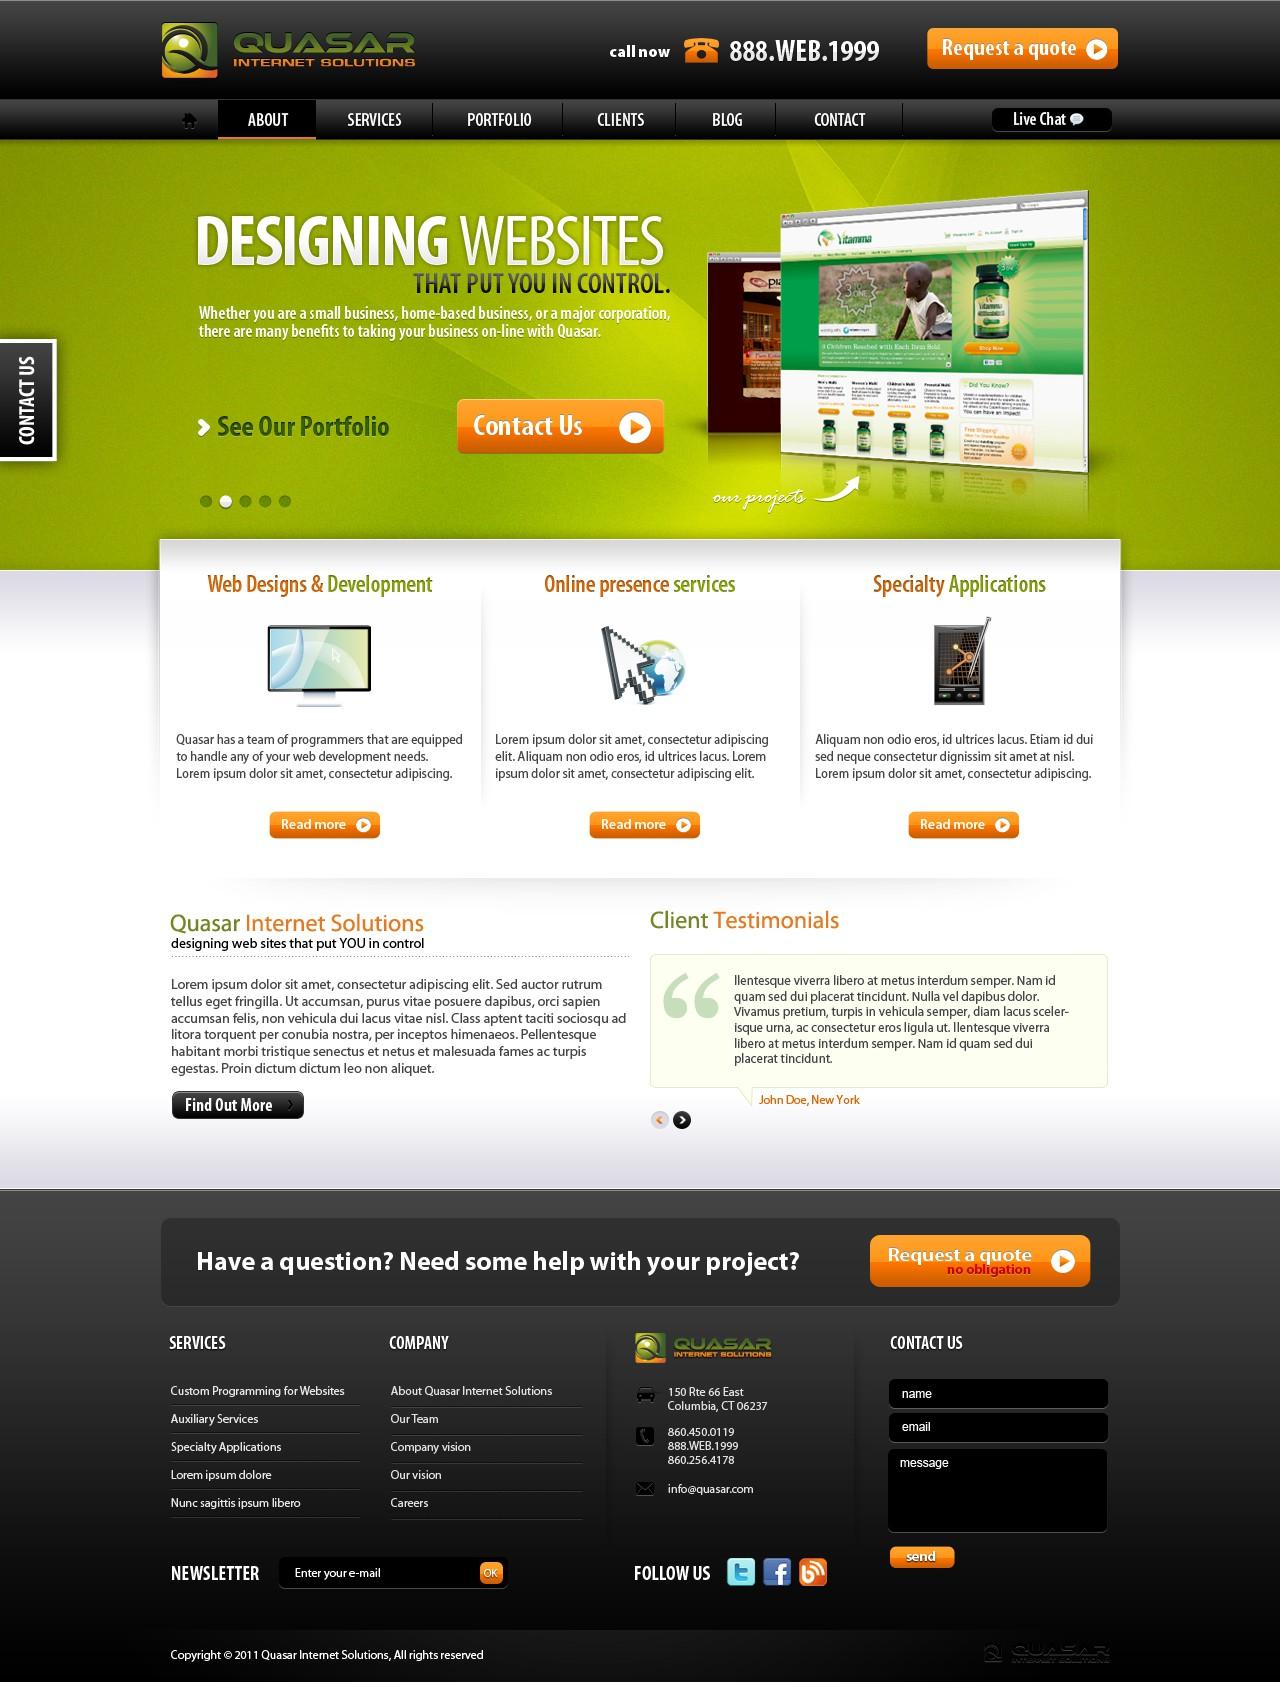 Quasar Internet Solutions needs a new website design